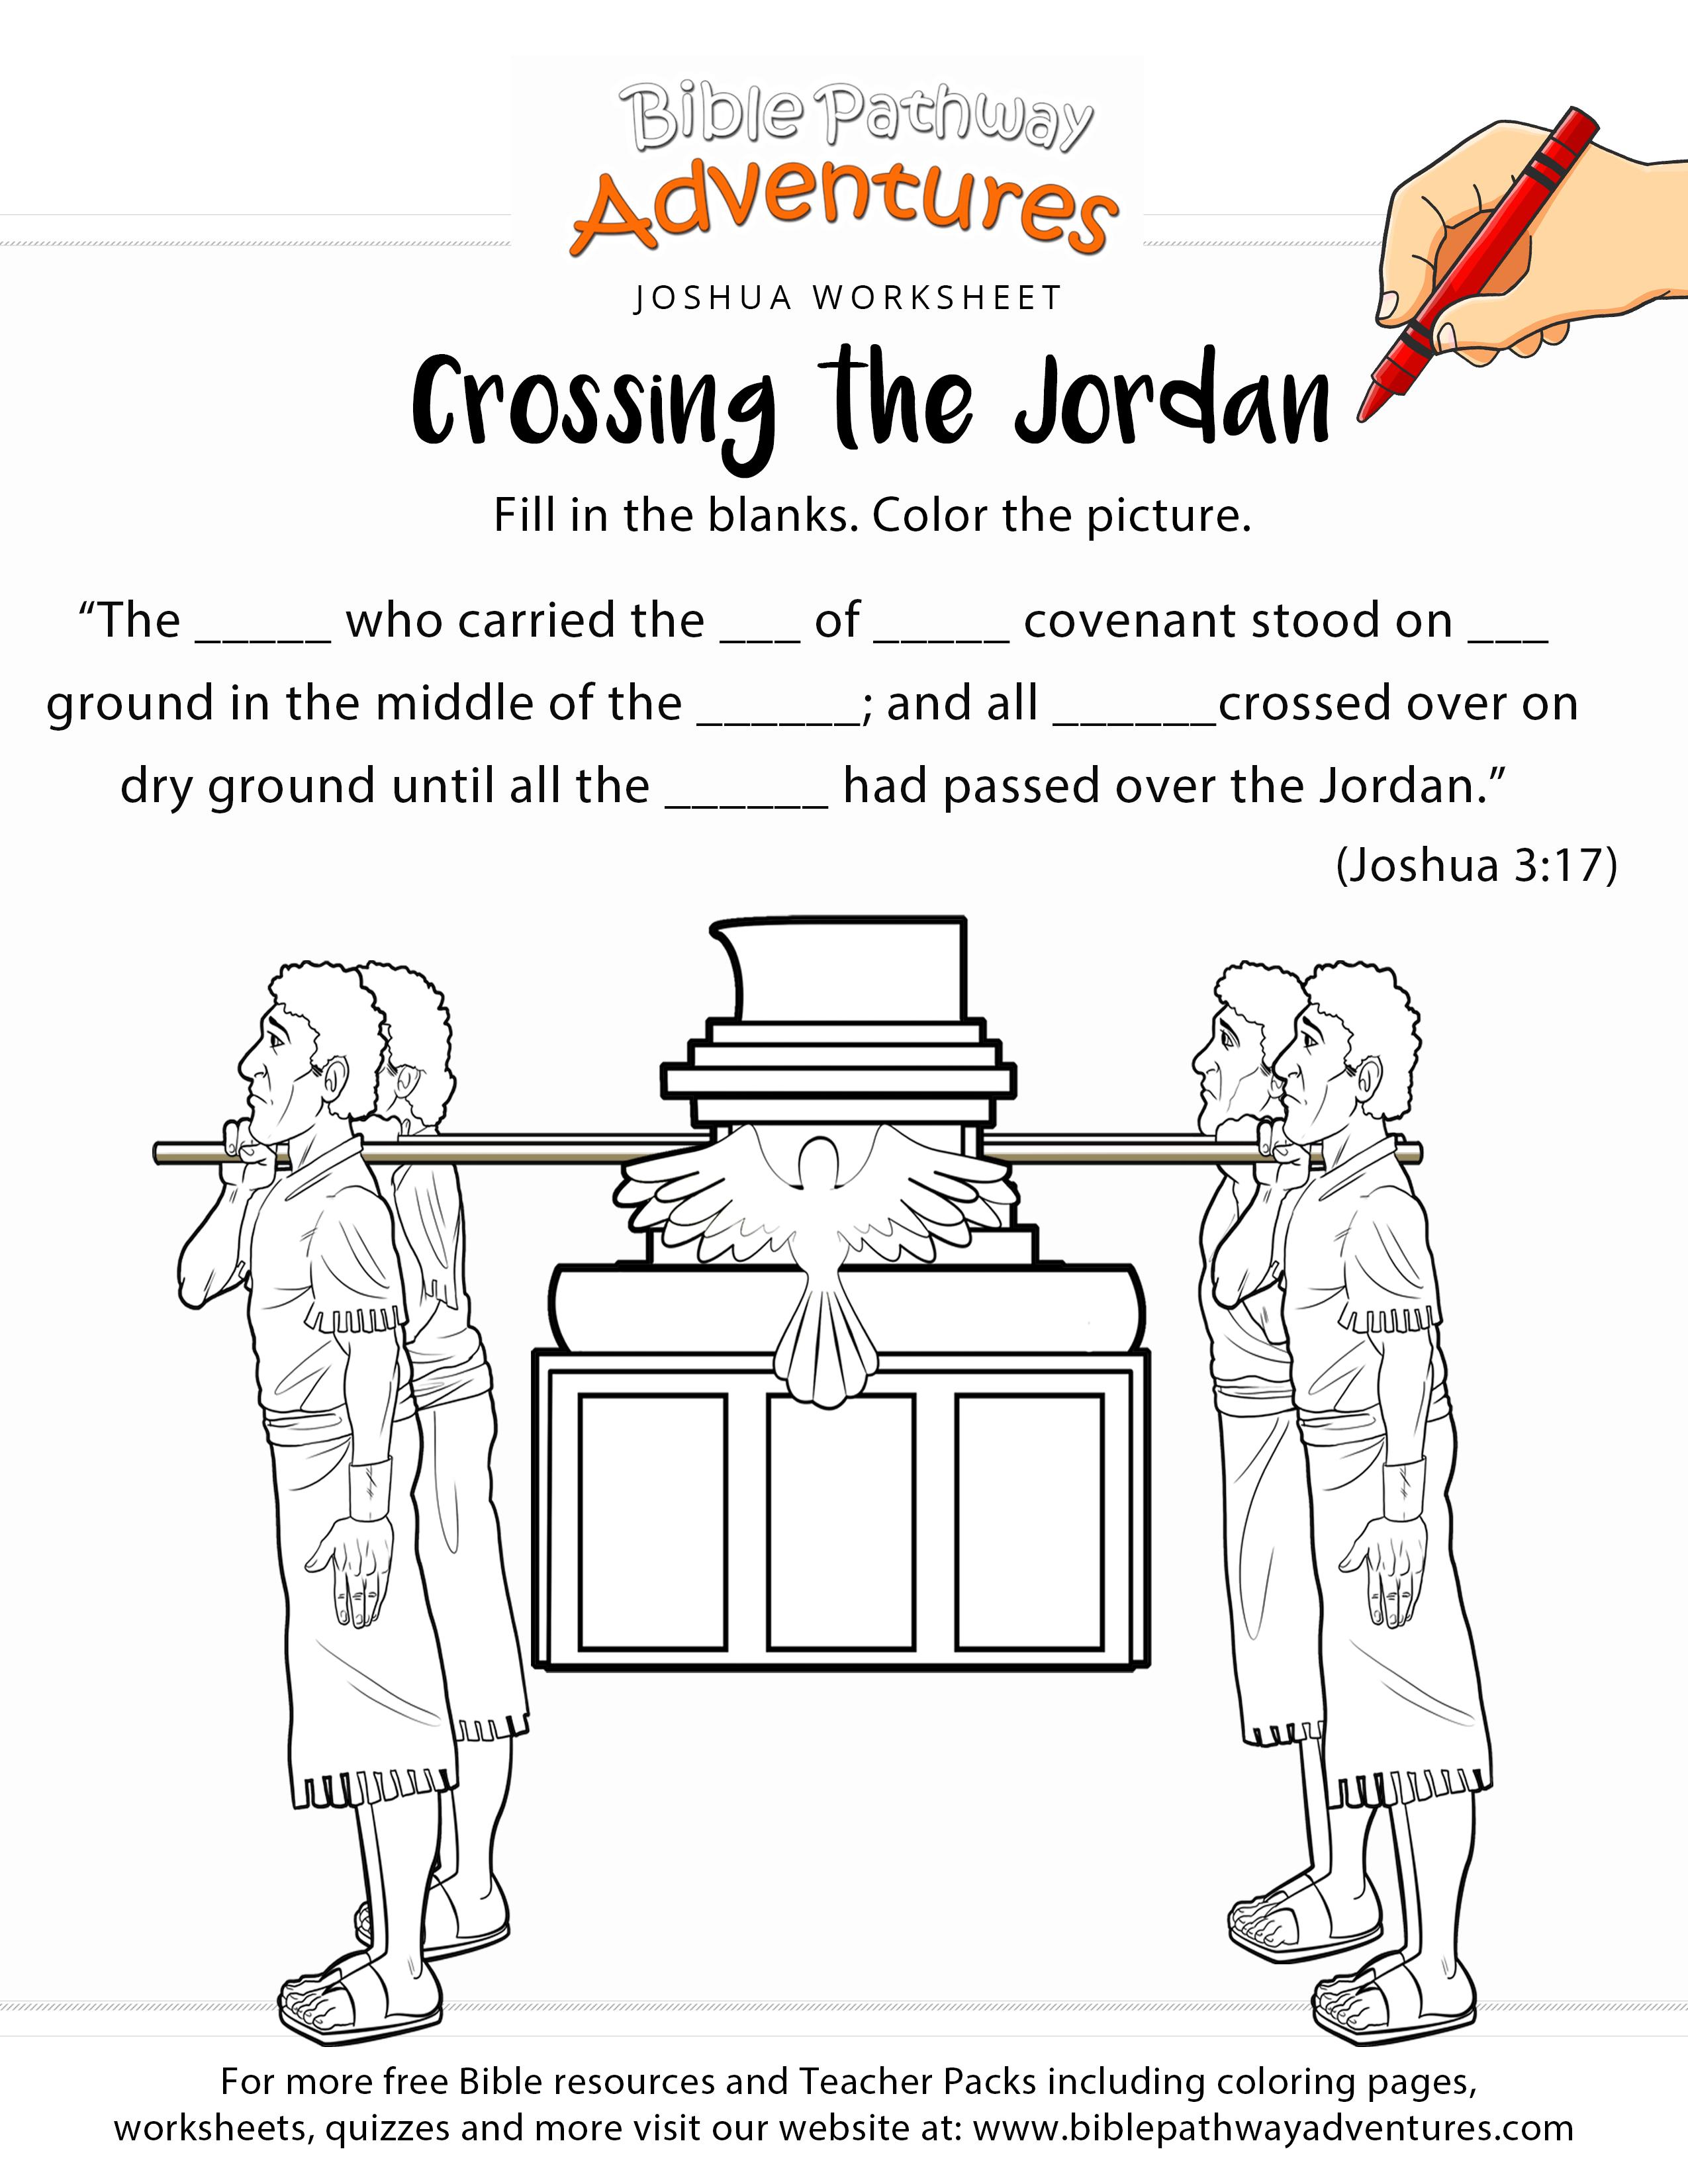 Crossing the Jordan Bible worksheet & coloring page